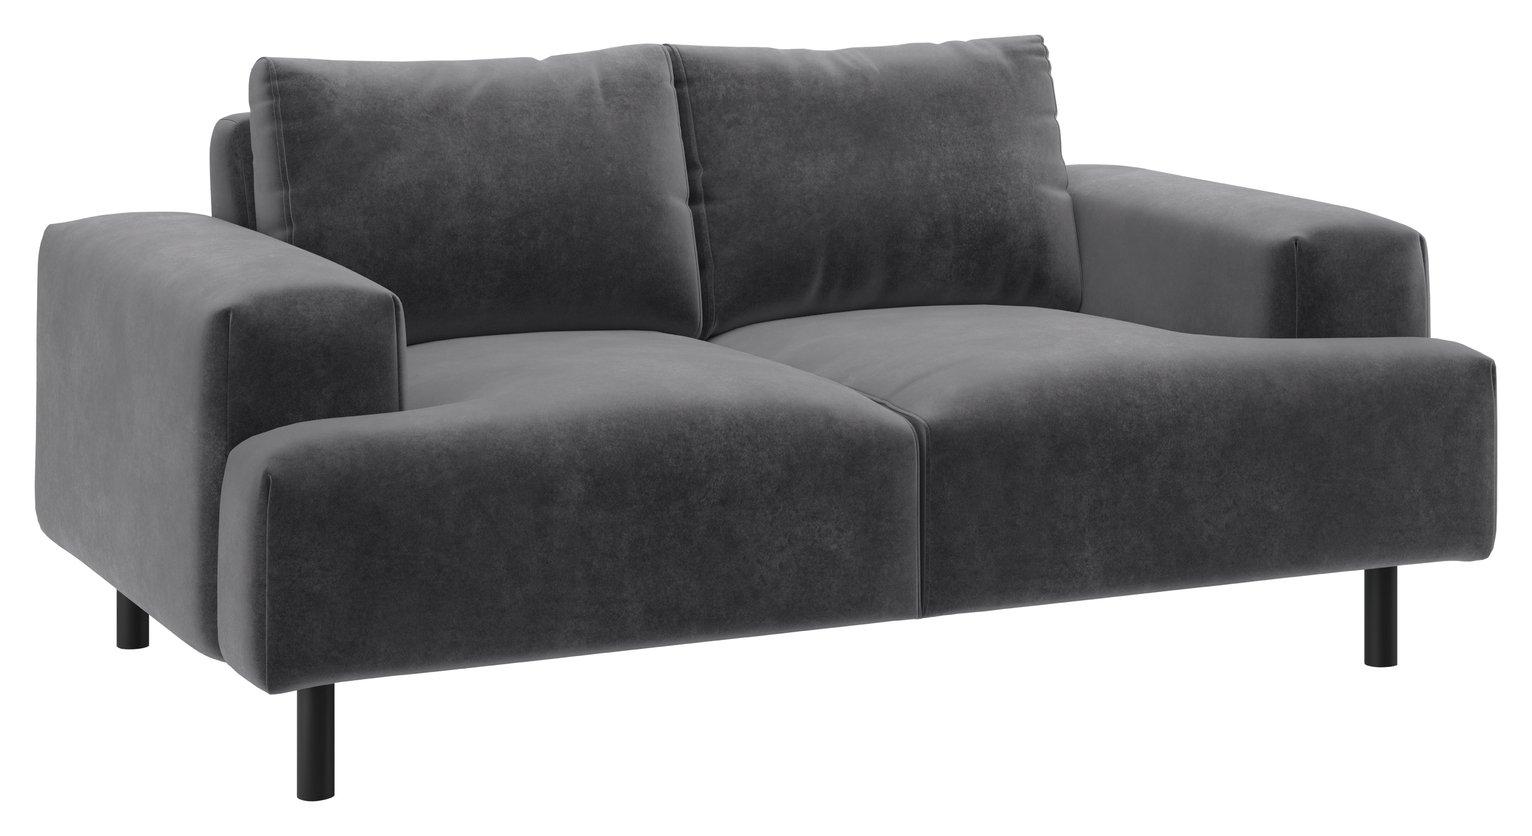 Habitat Julien 2 Seater Fabric Sofa - Grey